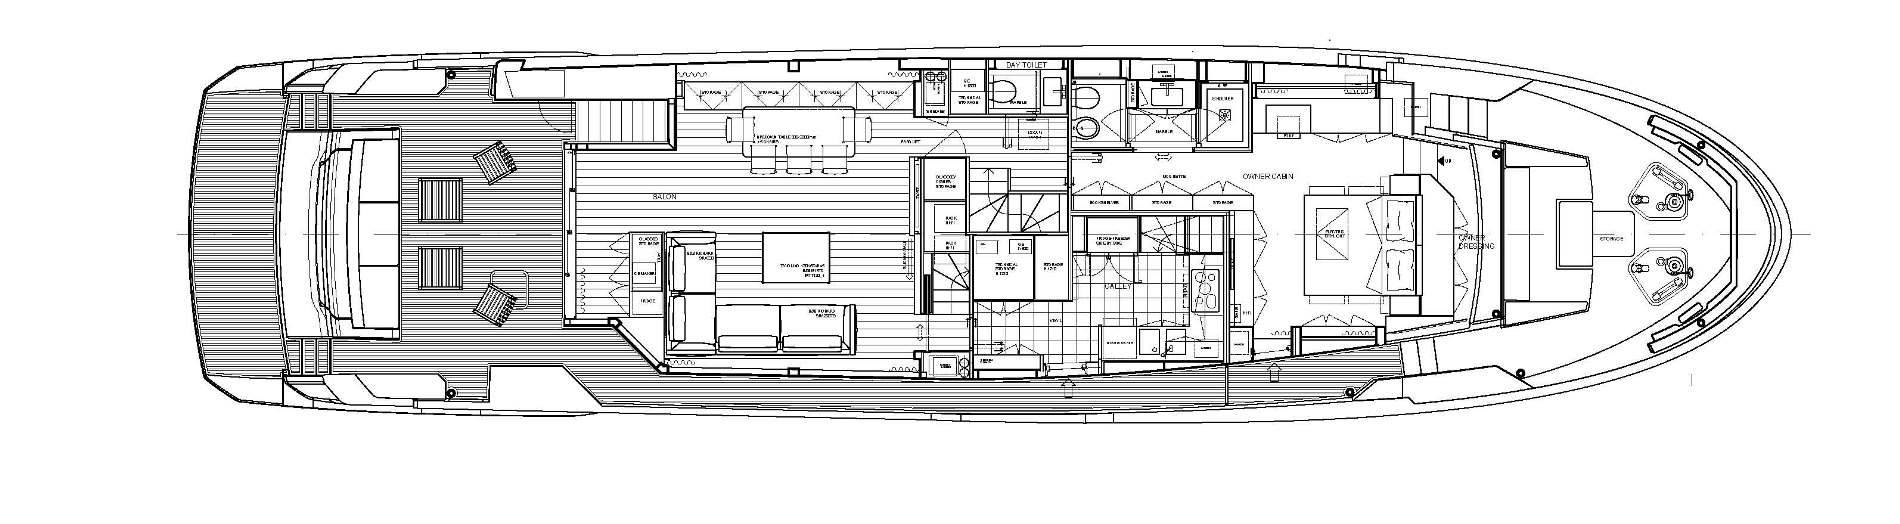 Sanlorenzo Yachts SL96 Asymmetric Главная палуба